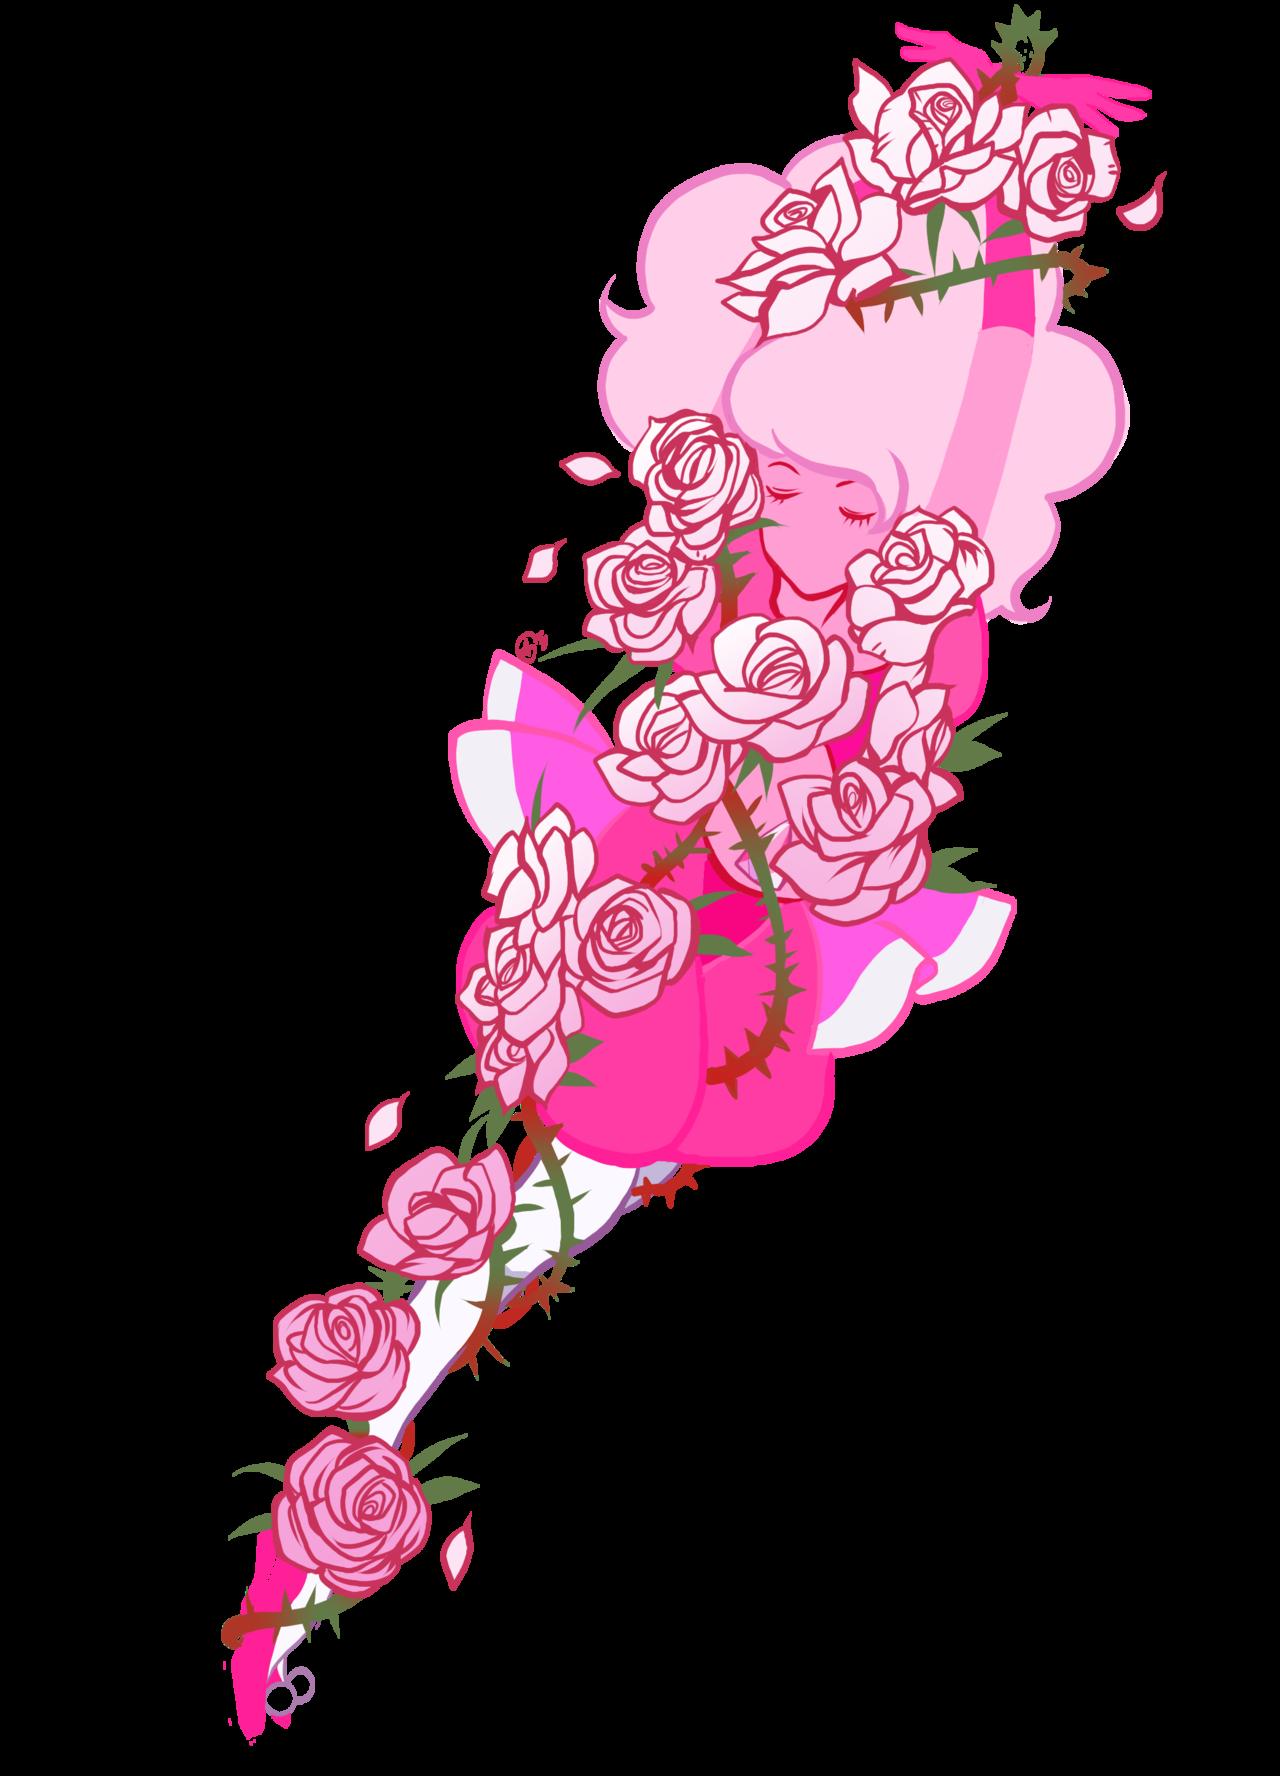 A Pink Sacrifice